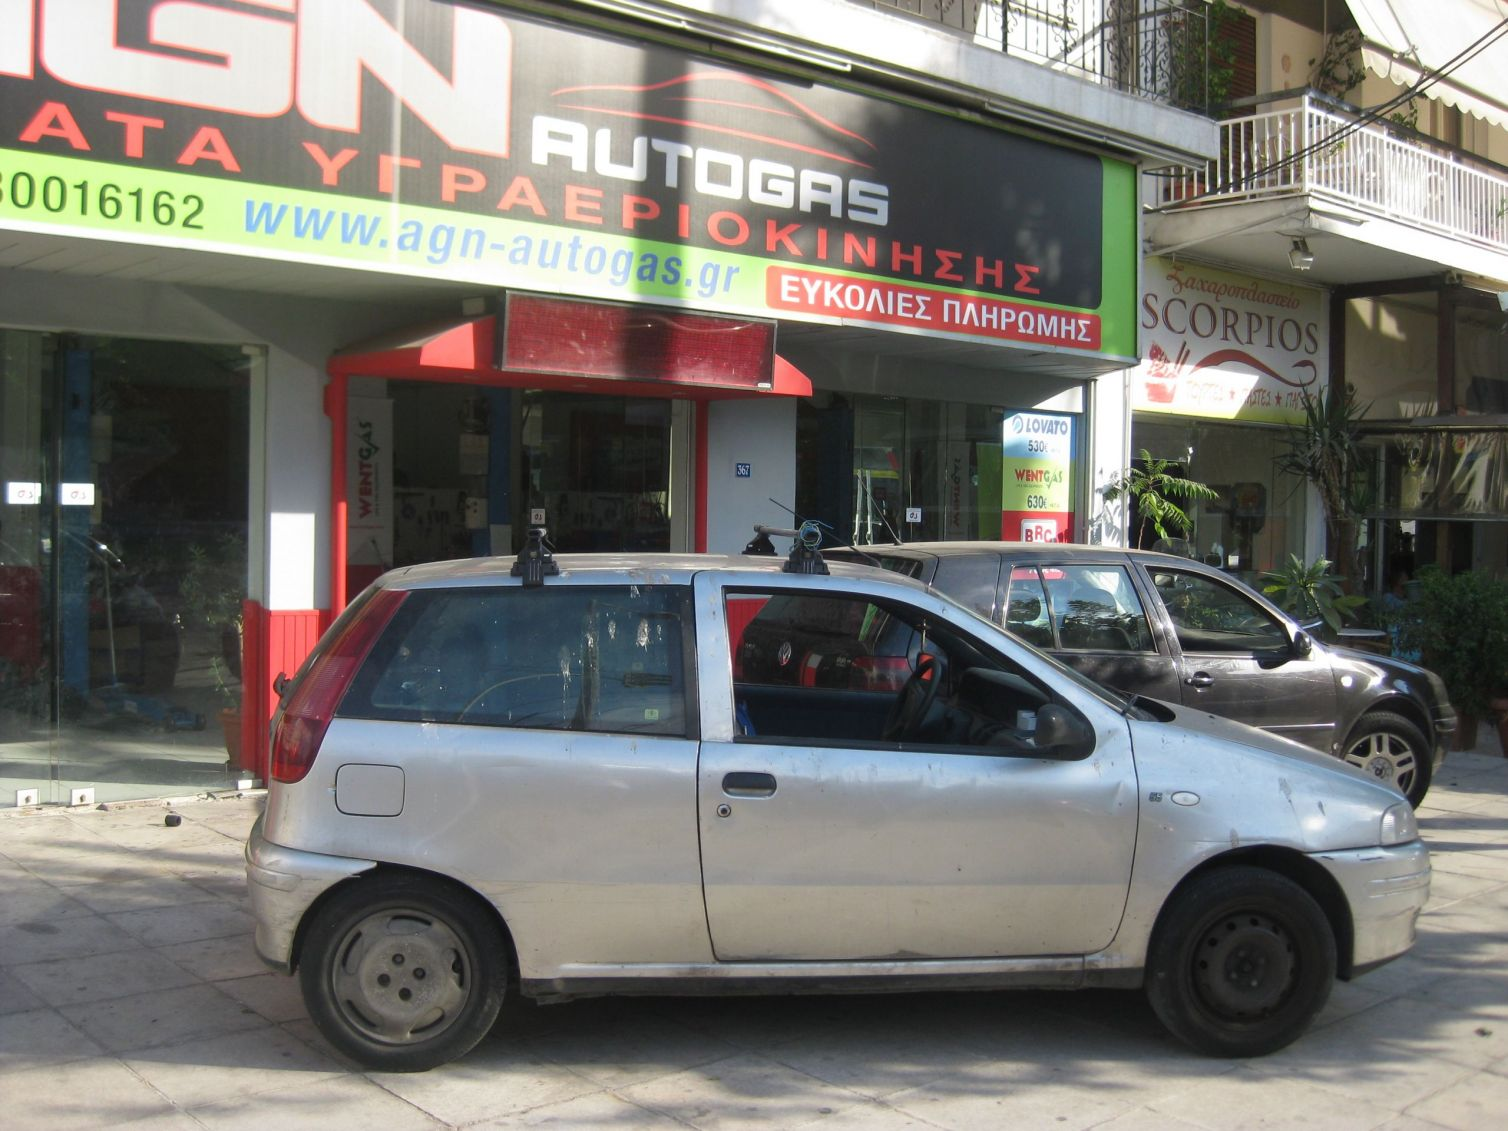 FIAT PUNTO 55 1100cc '97 MONOY ΨΕΚΑΣΜΟΥ ΜΕ BRC 47LT